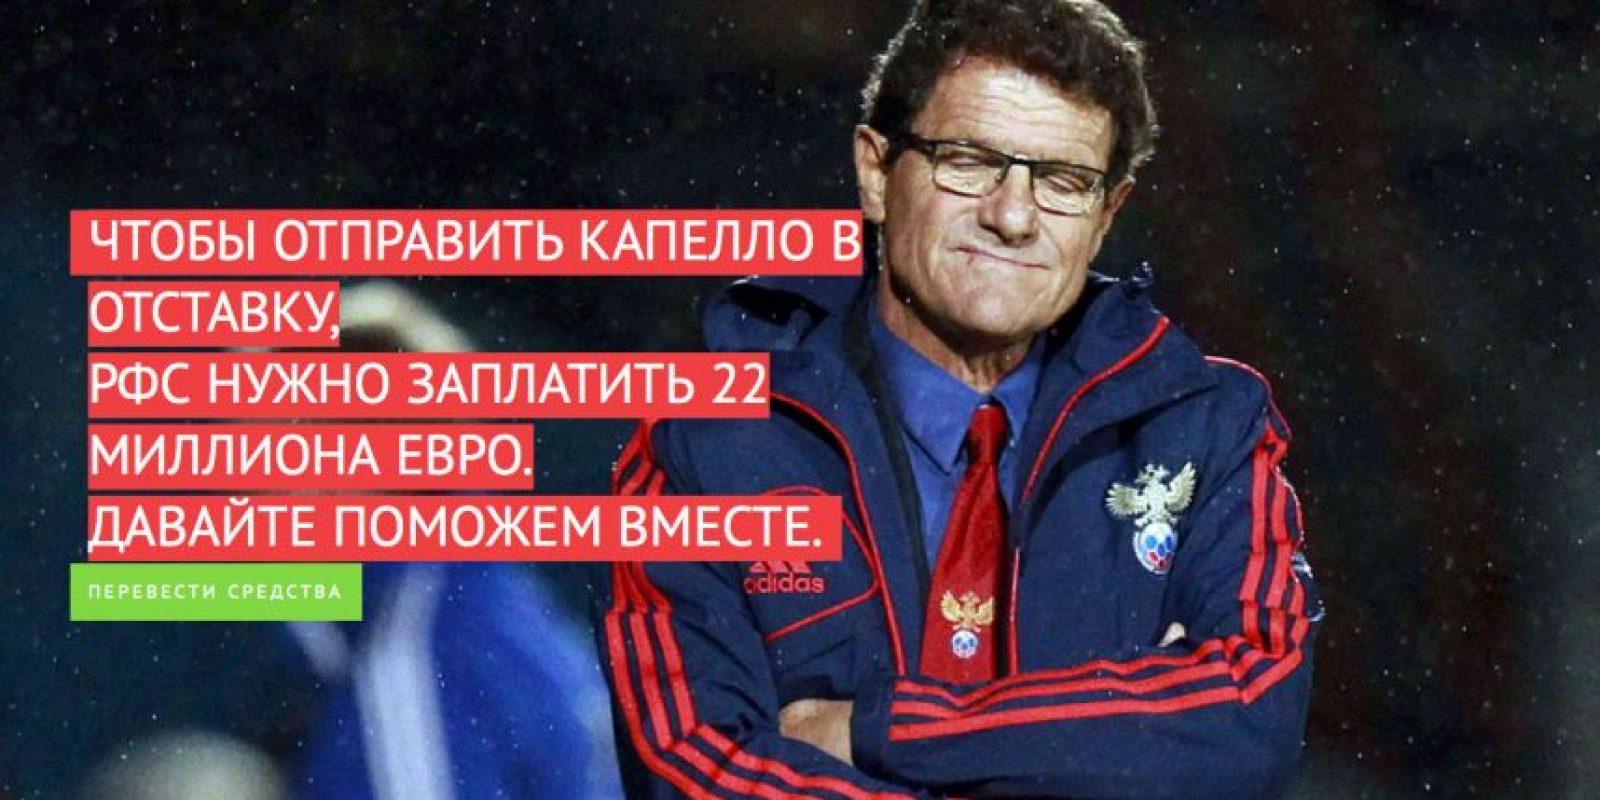 En Rusia ya no quieren a Fabio Capello. Foto:fabiogohome.betfoot.ru/